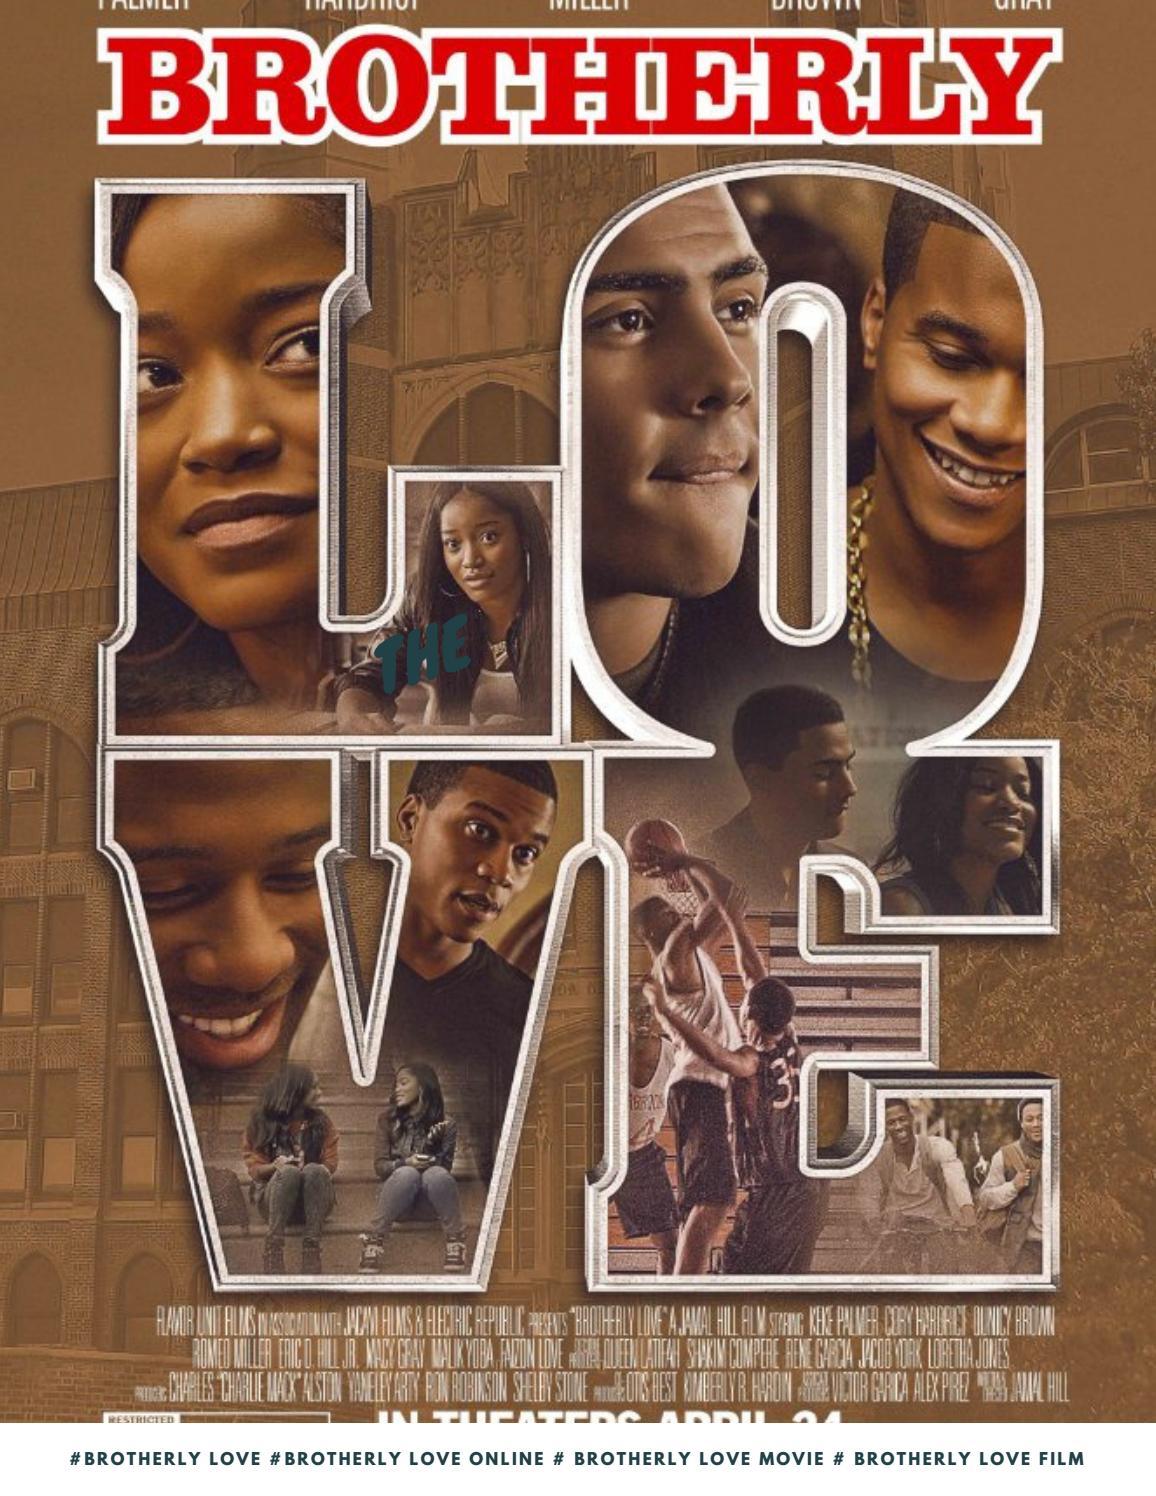 Brotherly Love(2015) Movies Online Free Unblocked On Schermovies